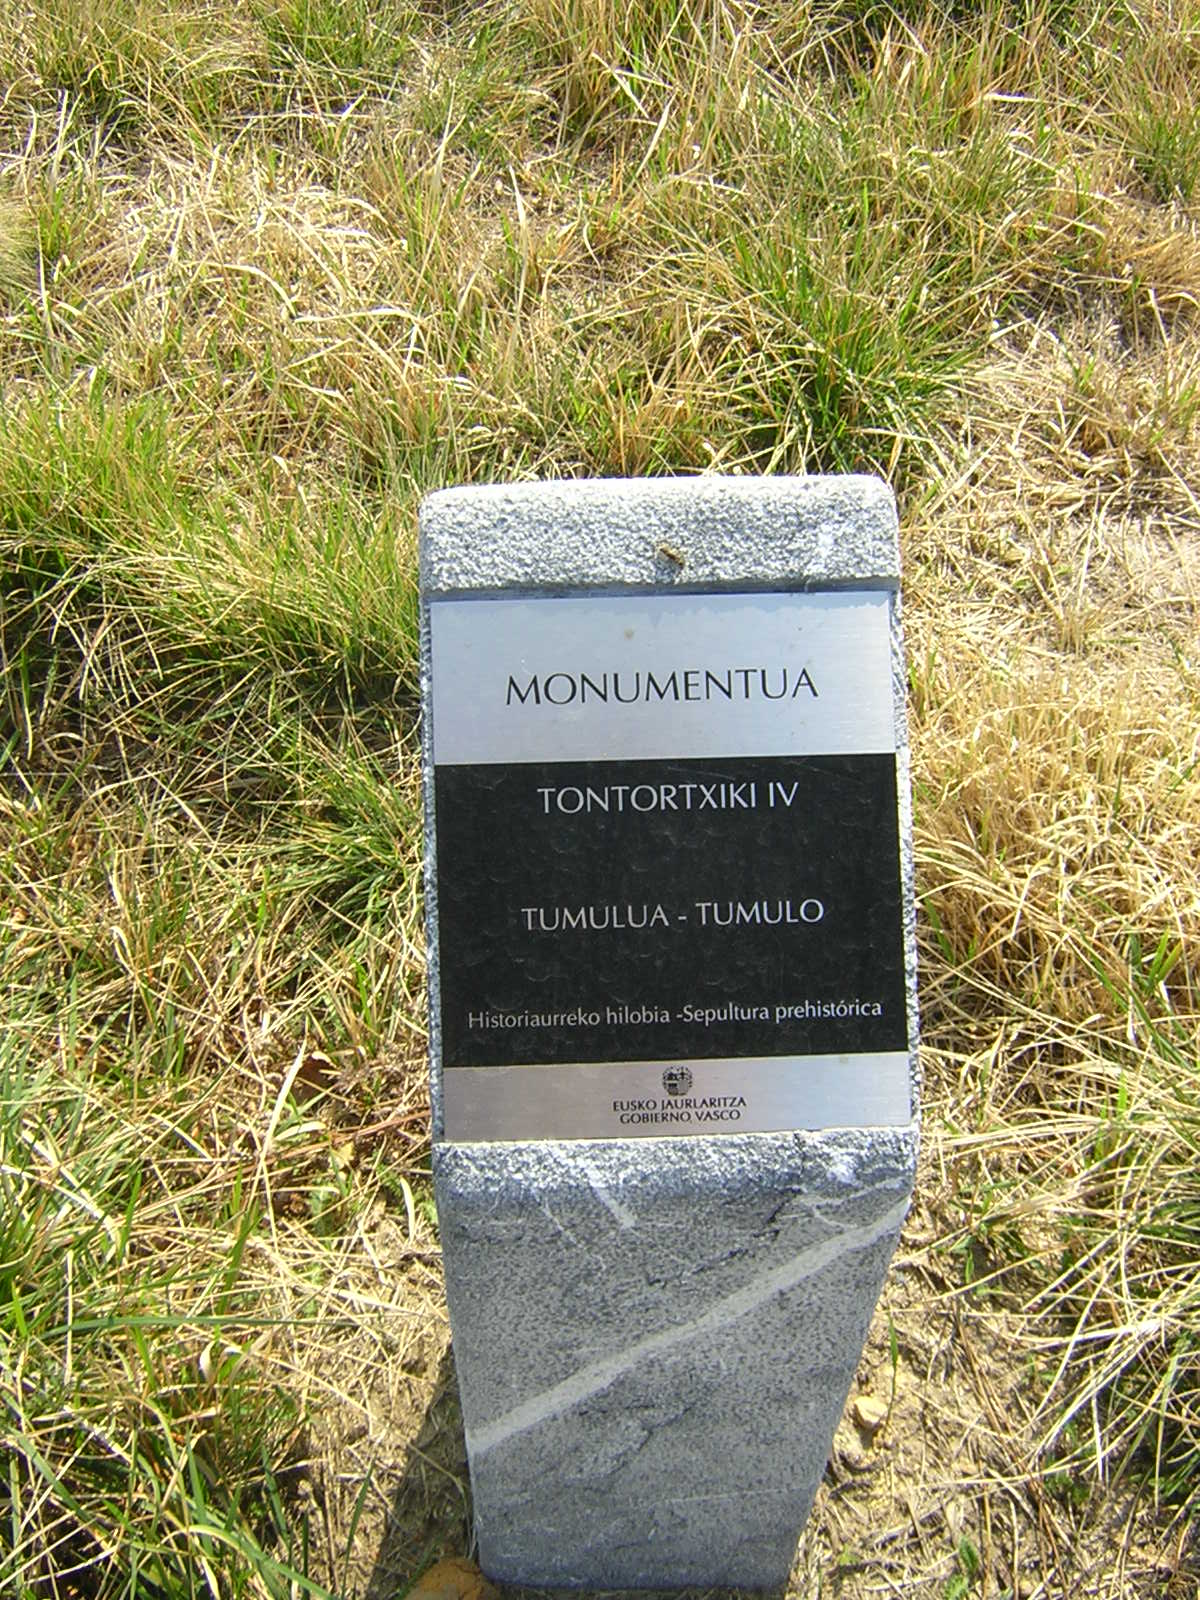 Túmulo Tontortxiki 4 Tumoloa